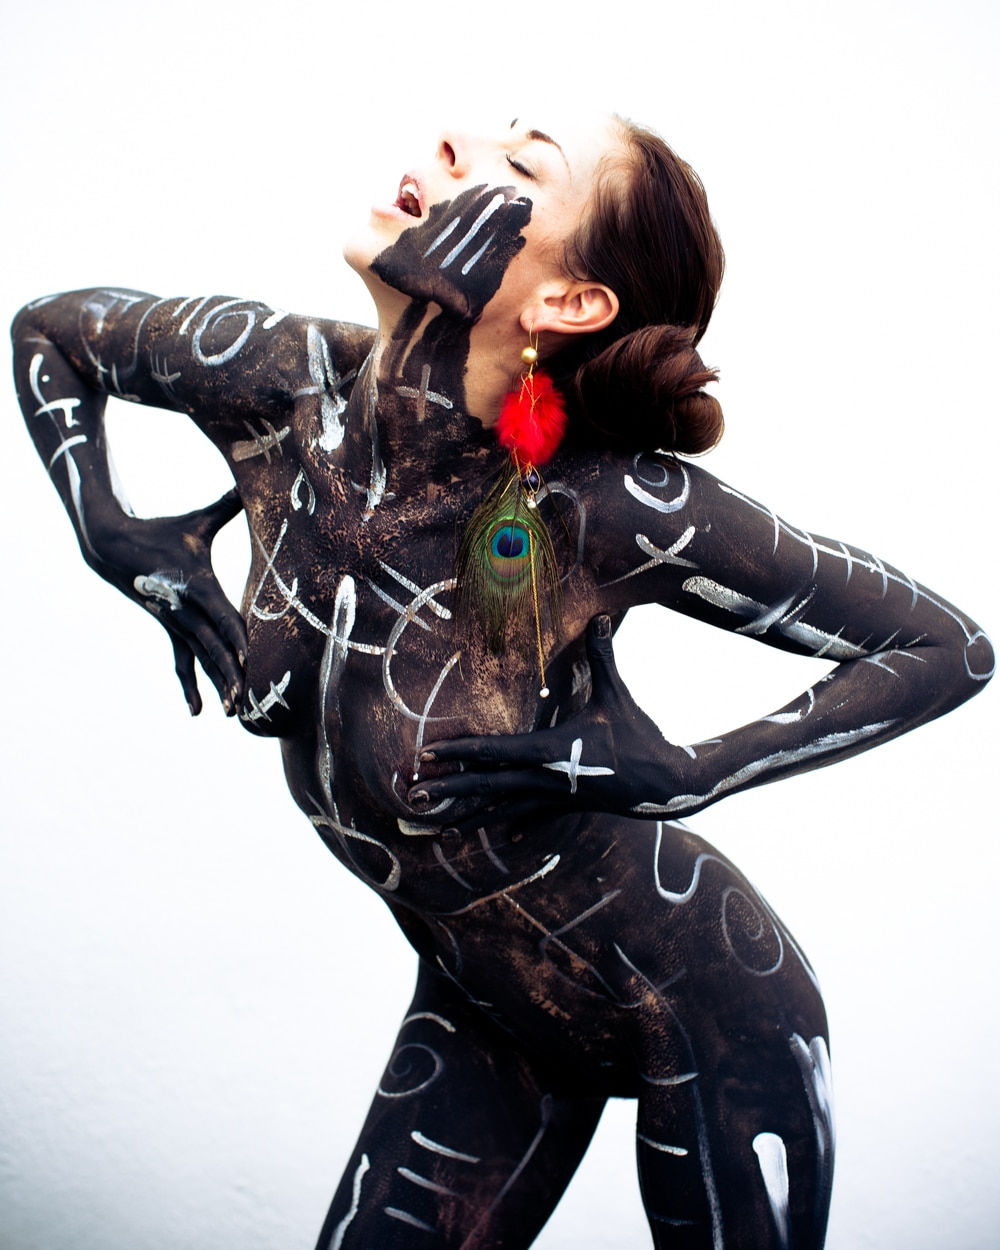 primal_fashion_by_gregory_beylerian-3